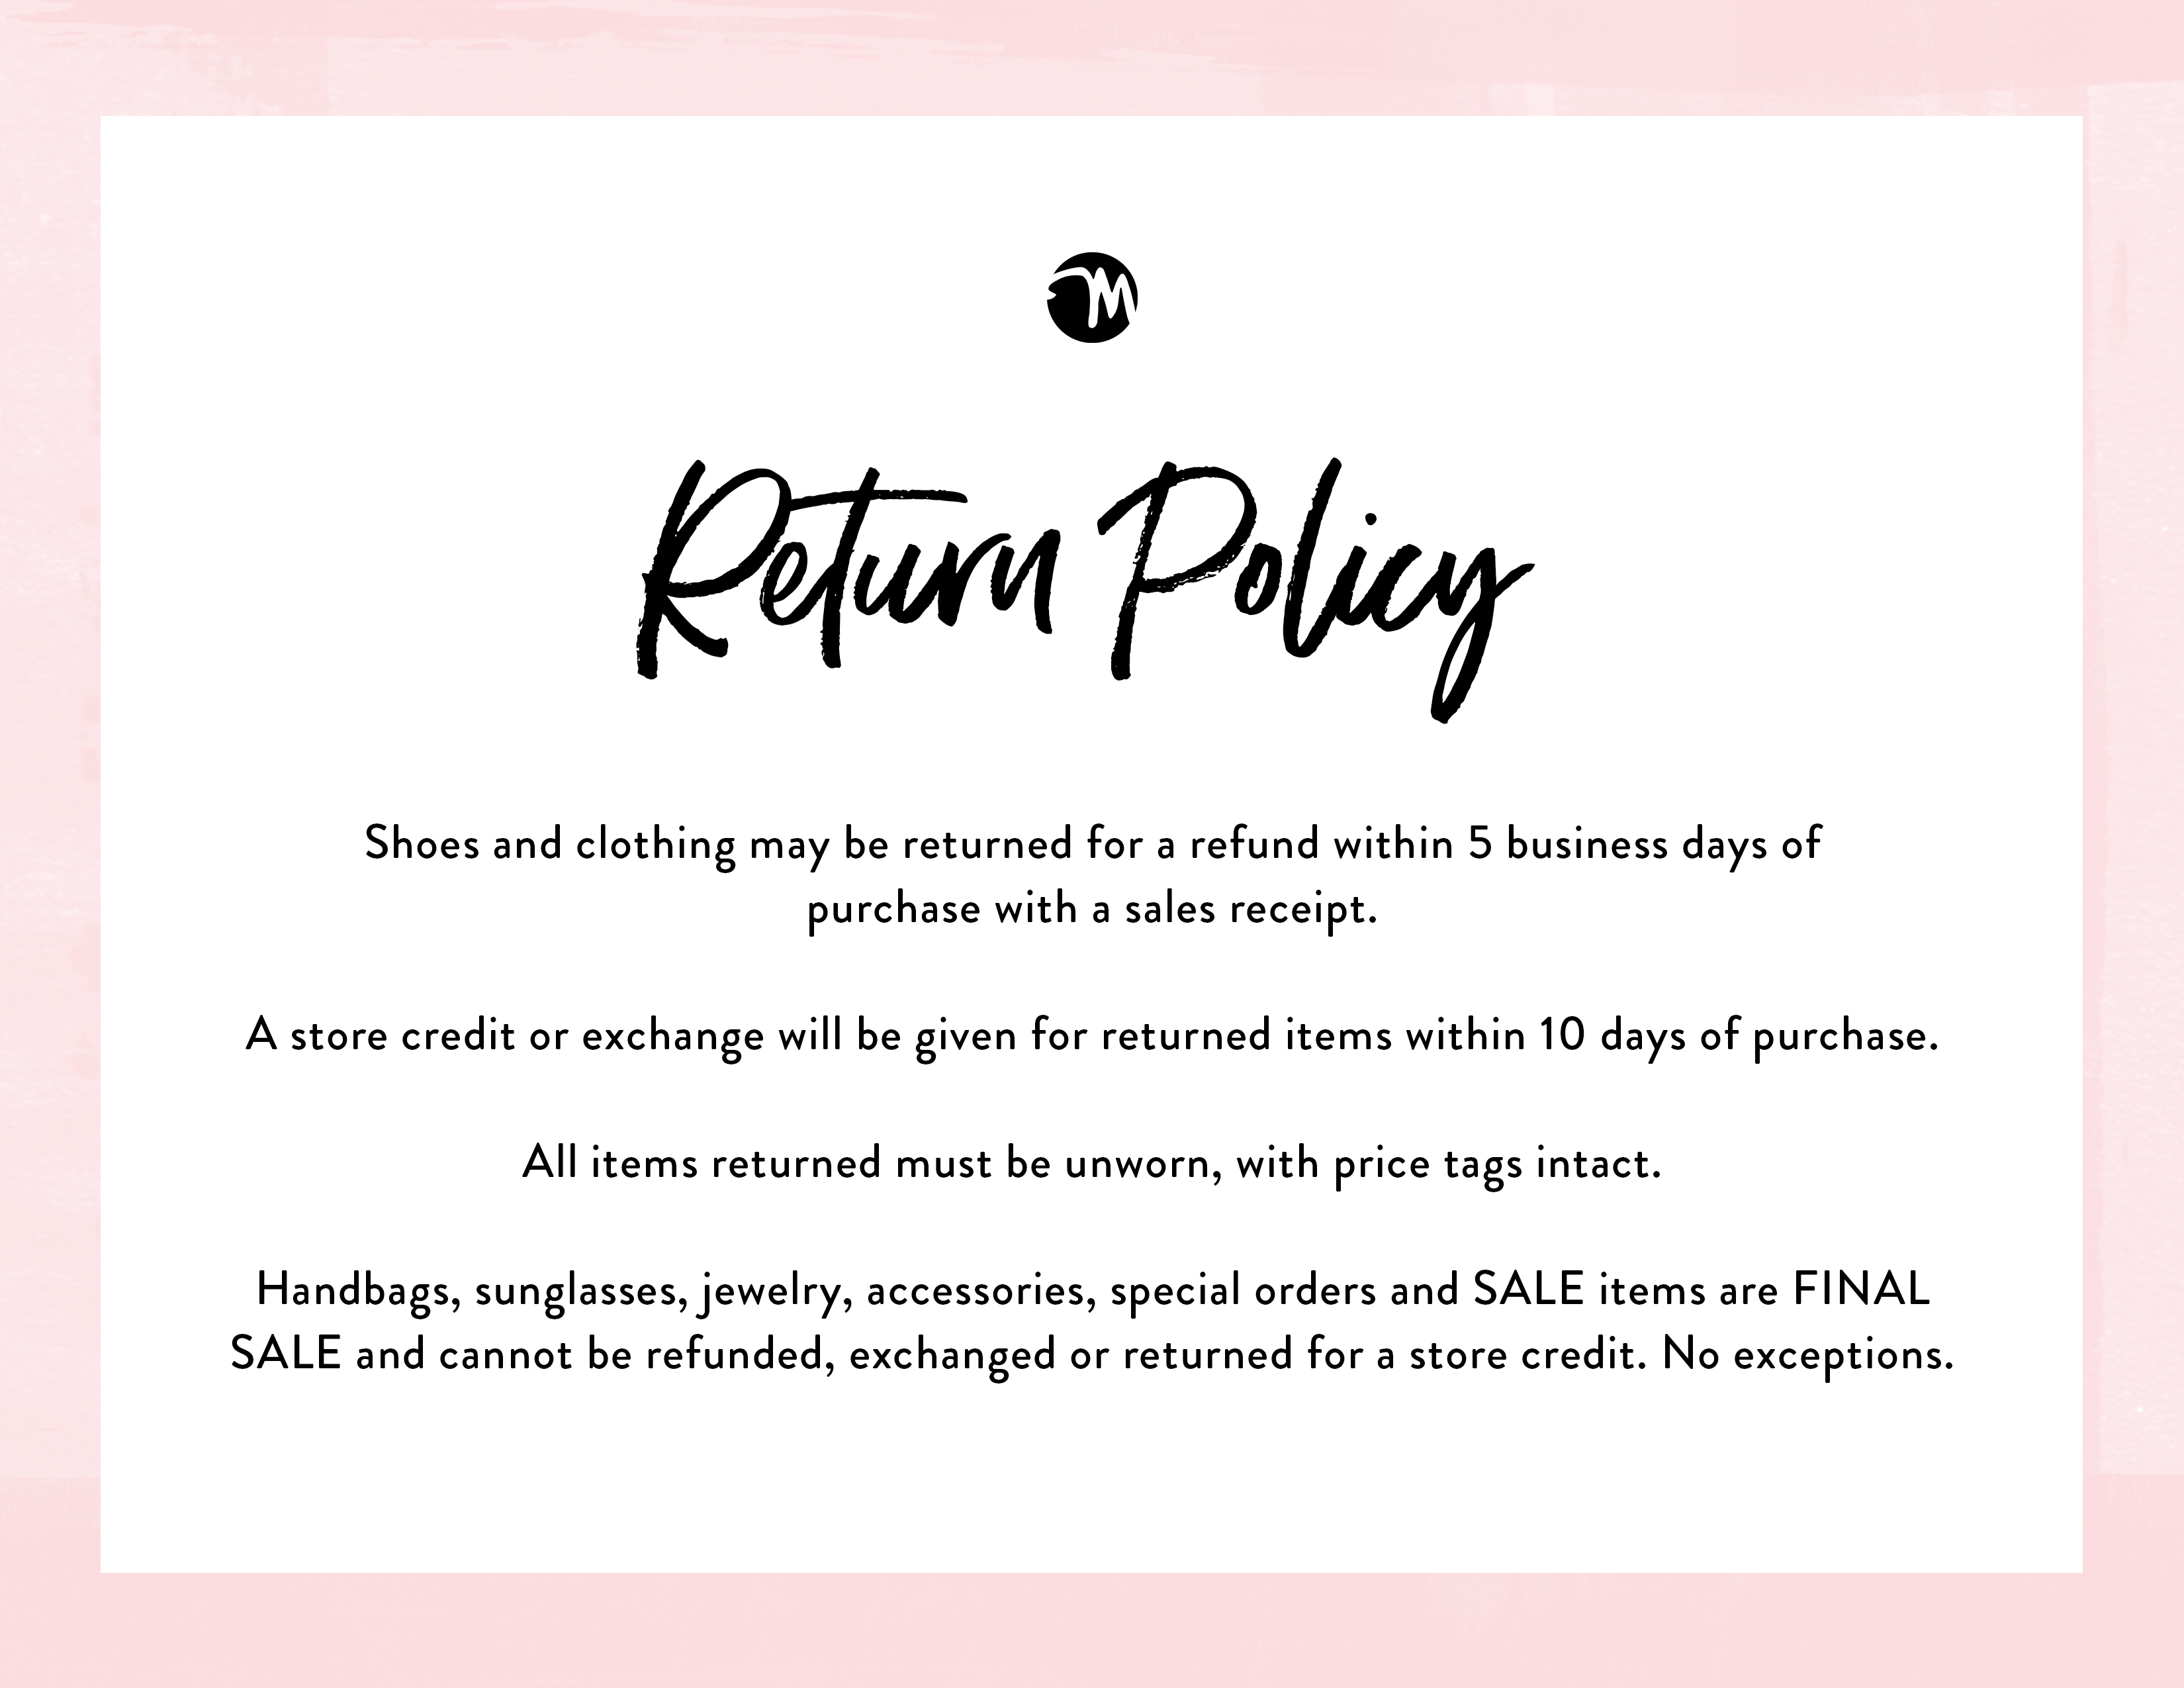 return-policy-sign-5x7.jpg